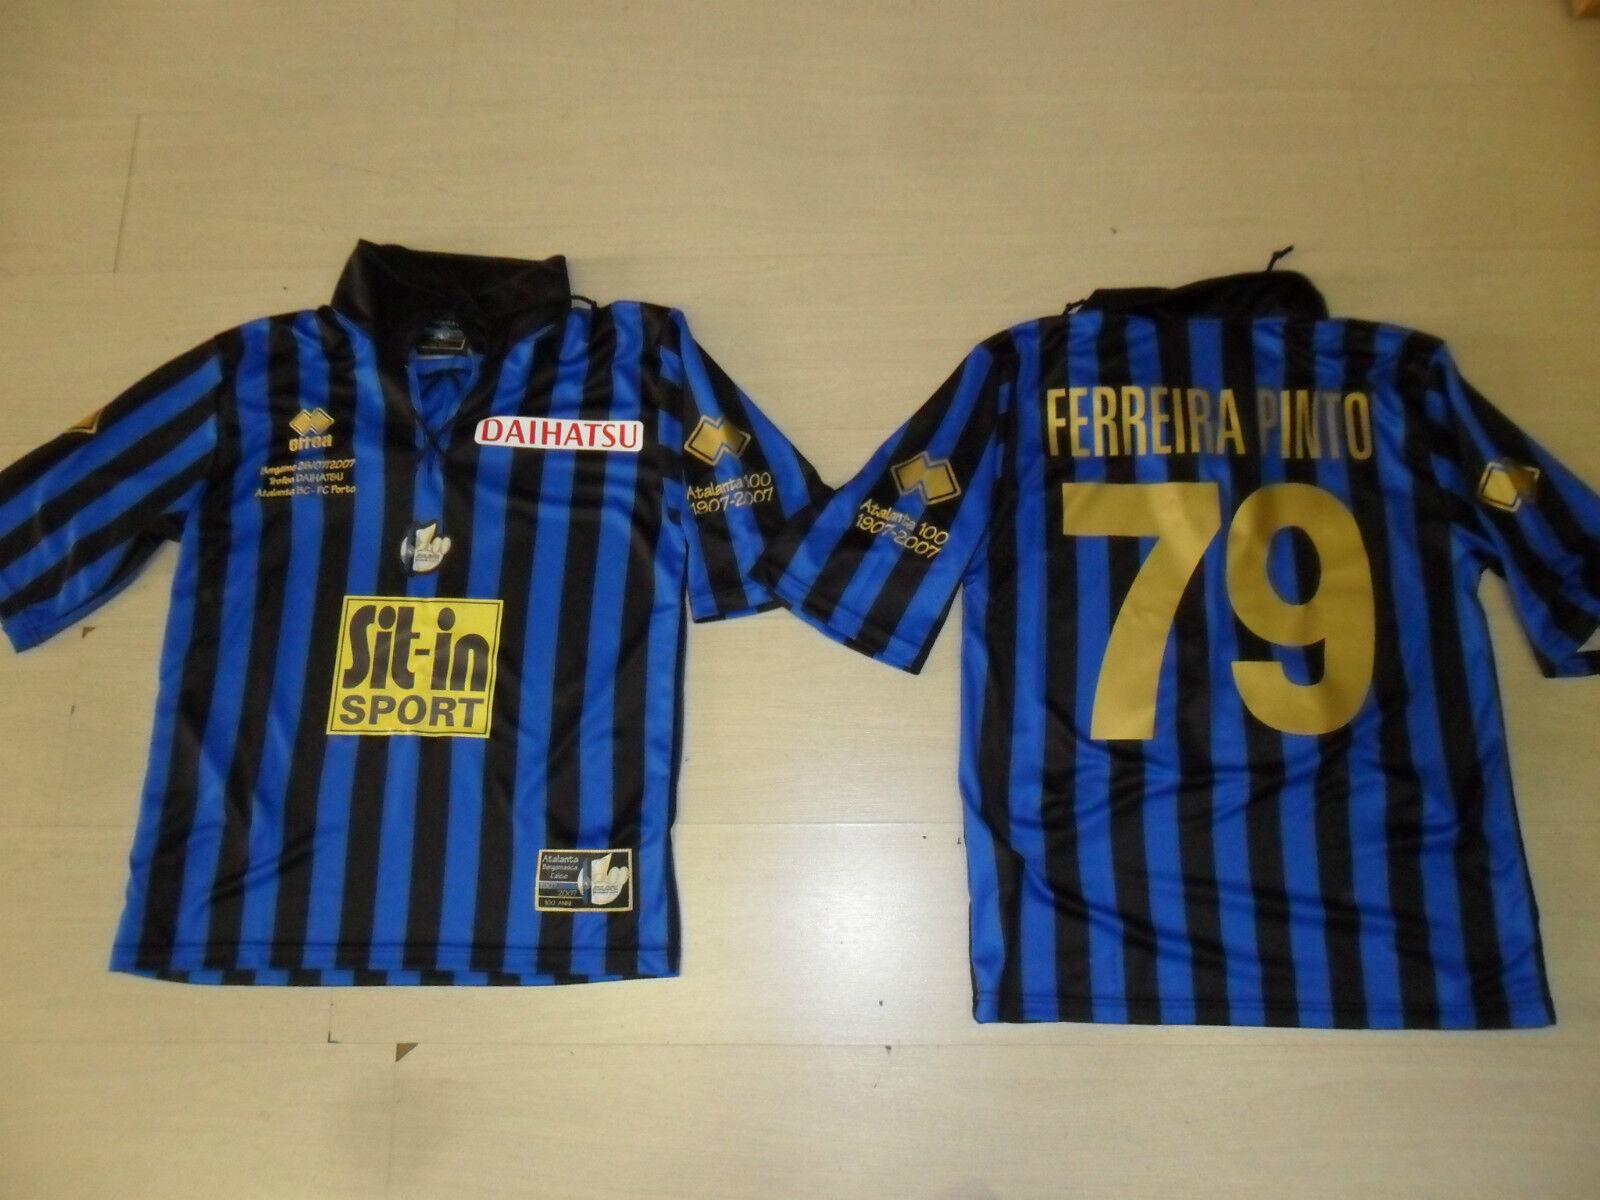 0901 M ATALANTA FERREIRA PINTO CENTENARIO DAIHATSU CUP MAGLIA MAGLIETTA JERSEY